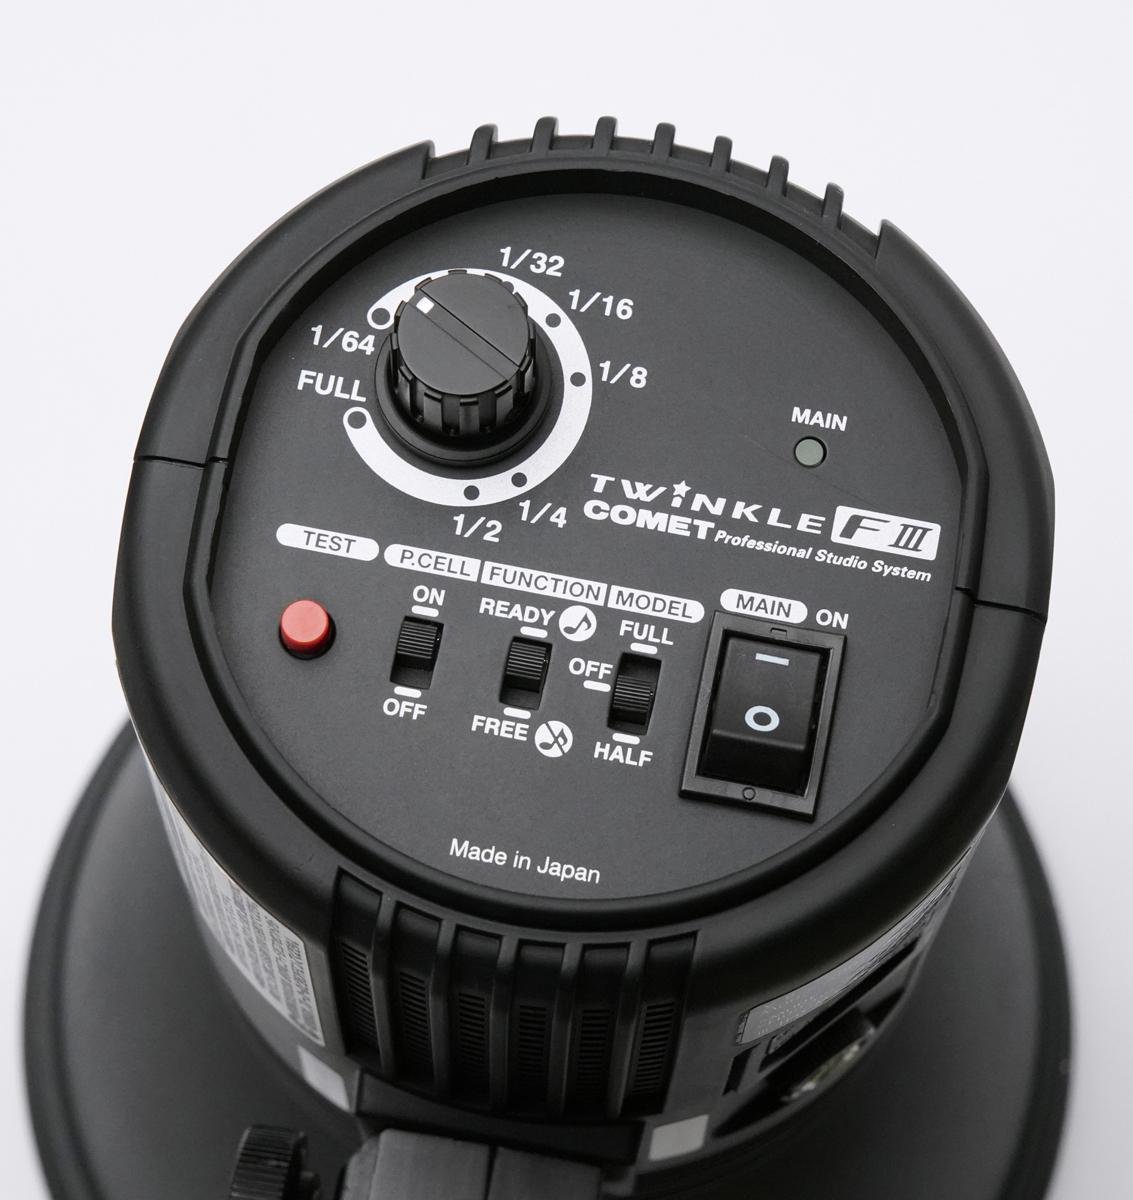 COMET コメット TWINKLE 04F III + CX-Cリフレクター テスト発光のみ美品_画像4